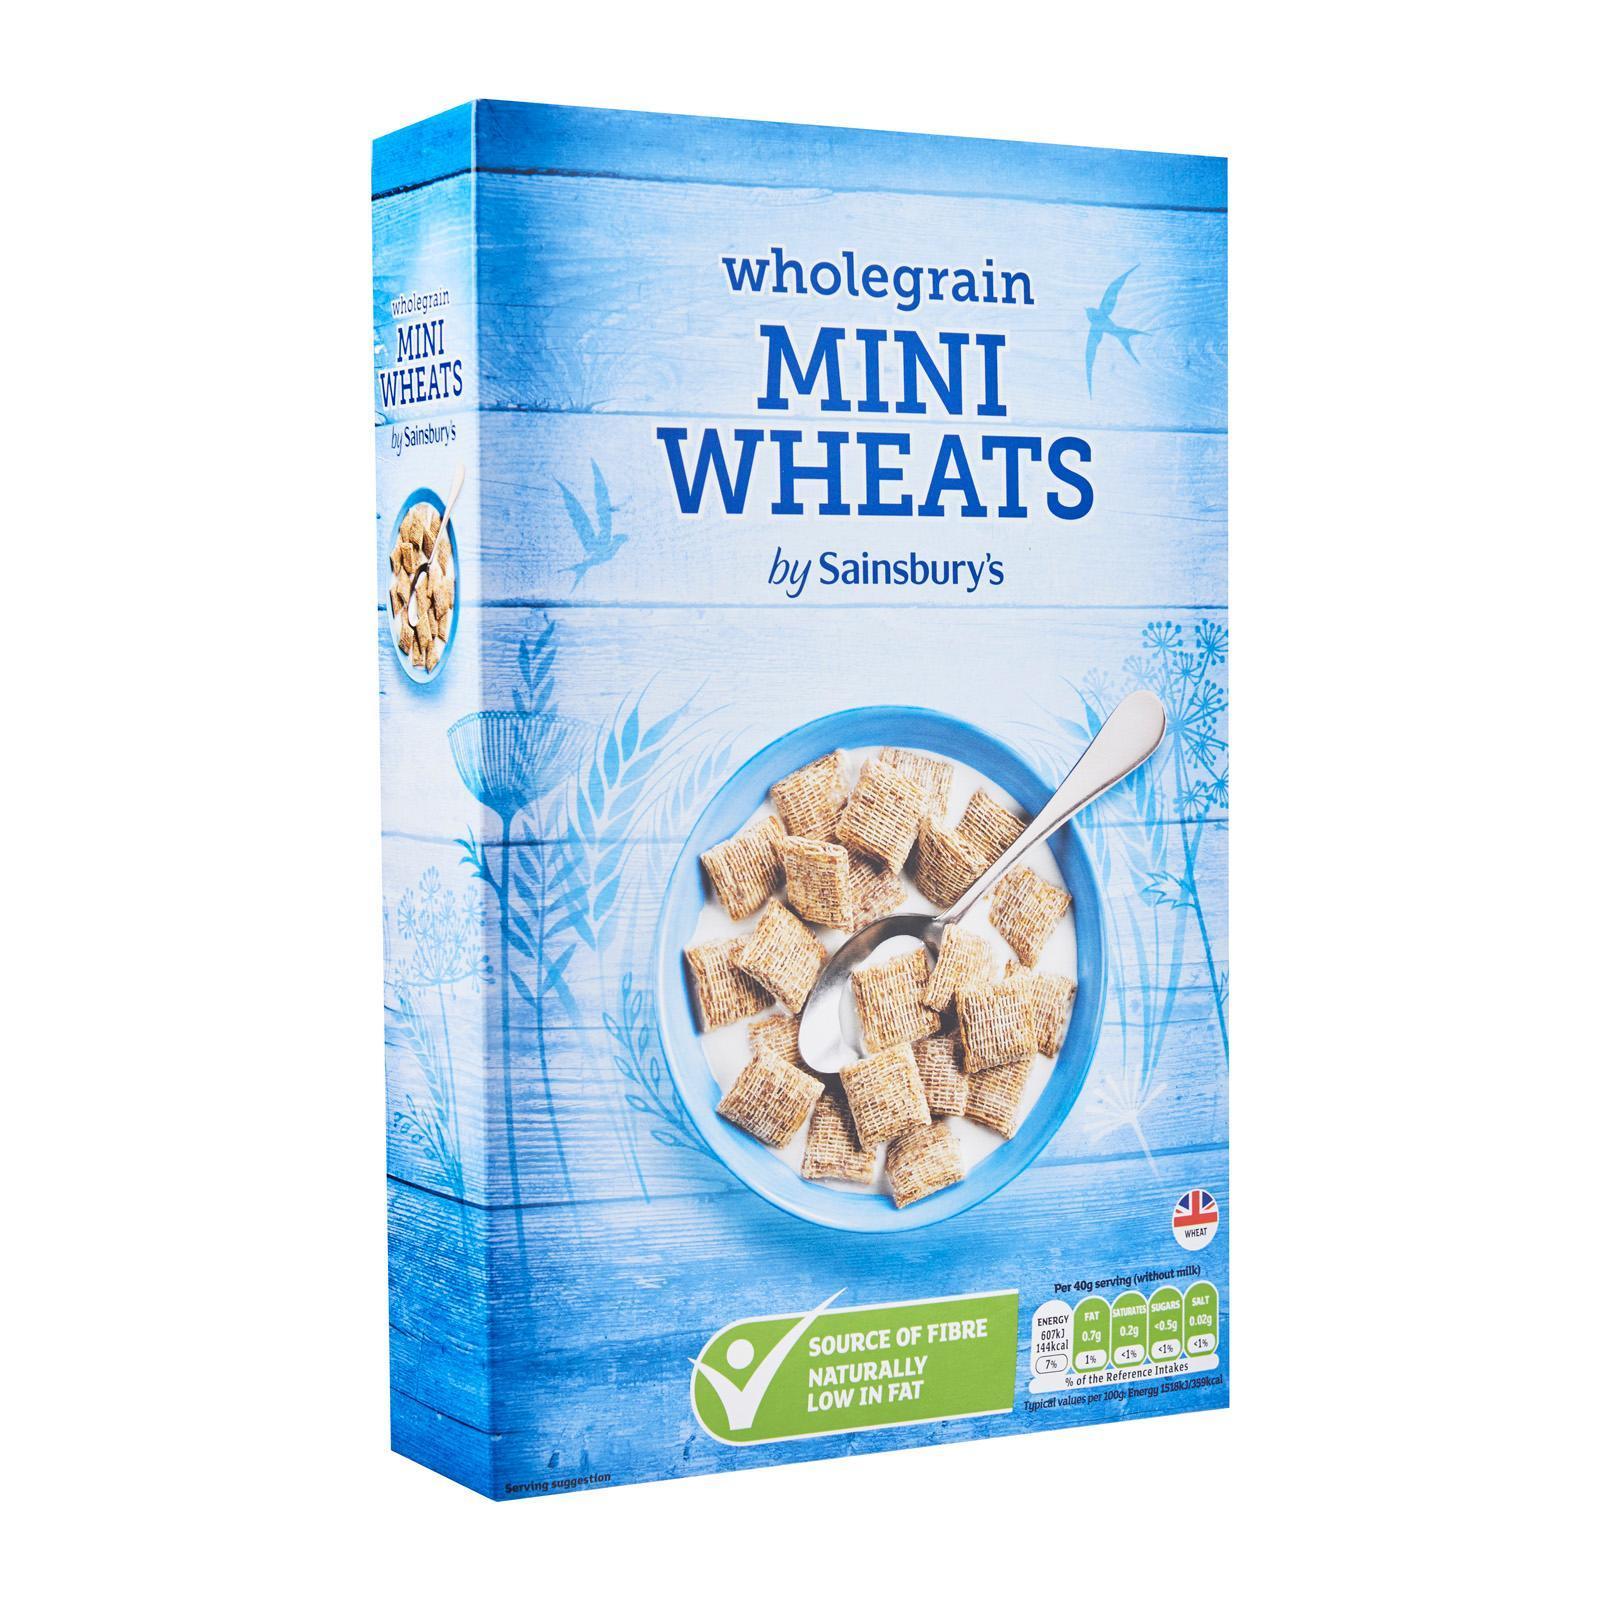 Sainsbury's Wholegrain Mini Wheats Cereal